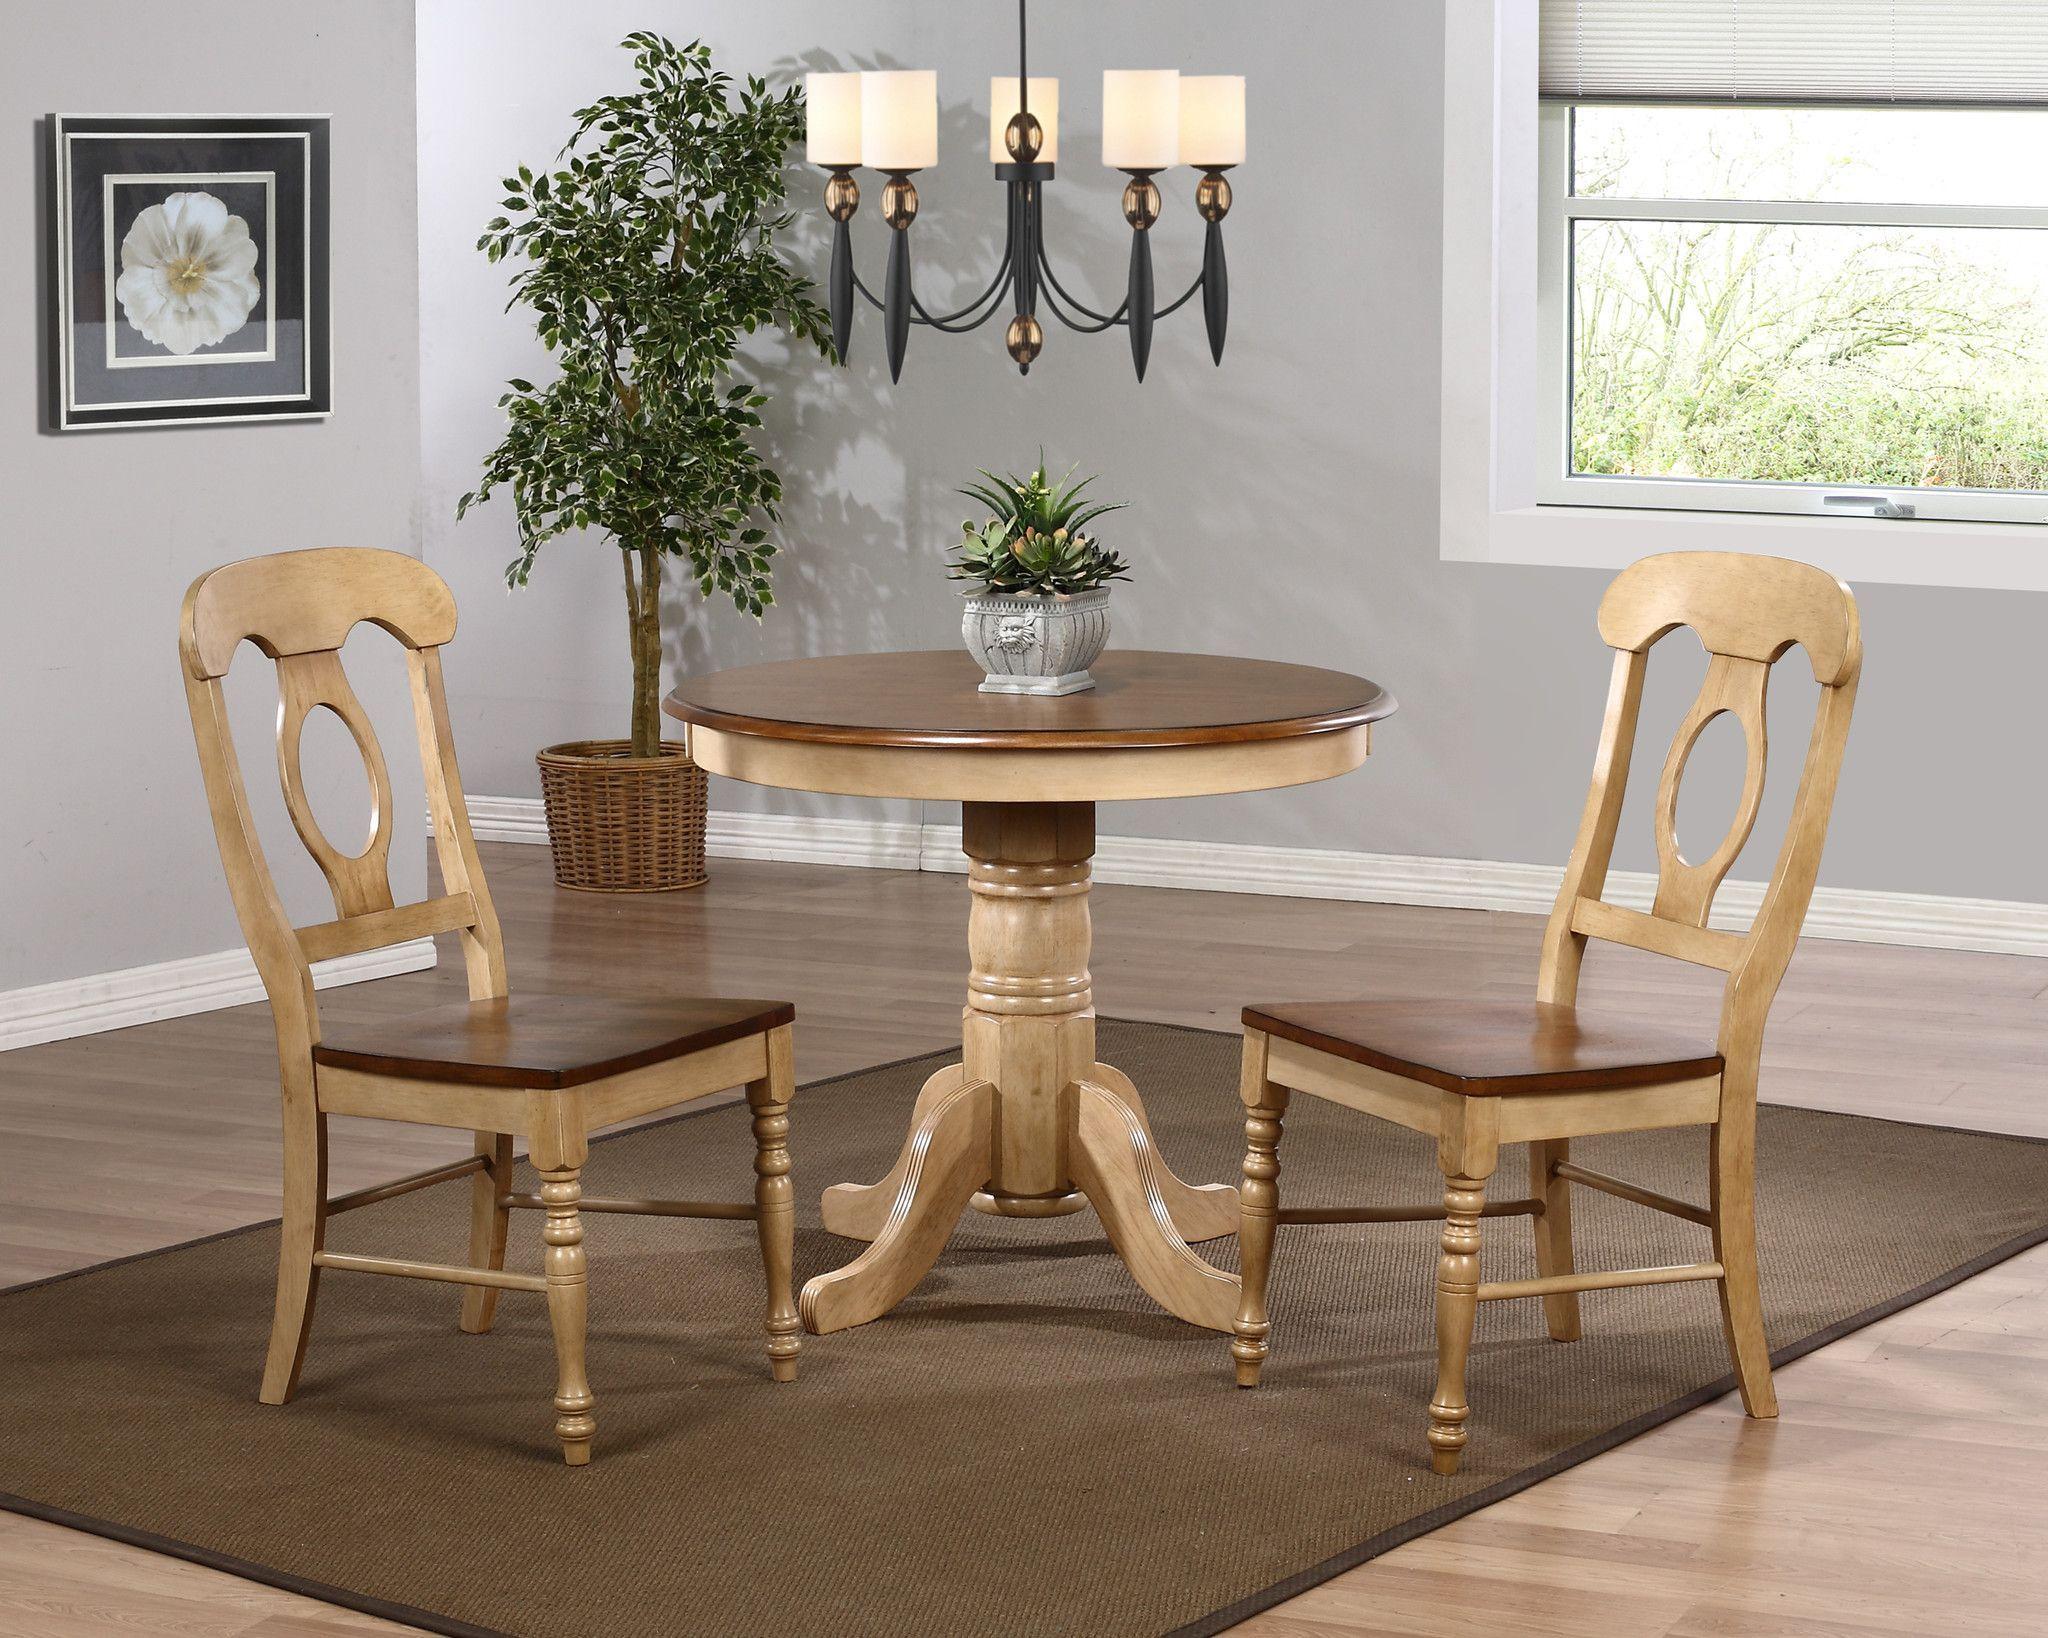 Sunset trading pc brook u dlubrcpwpc round dining set